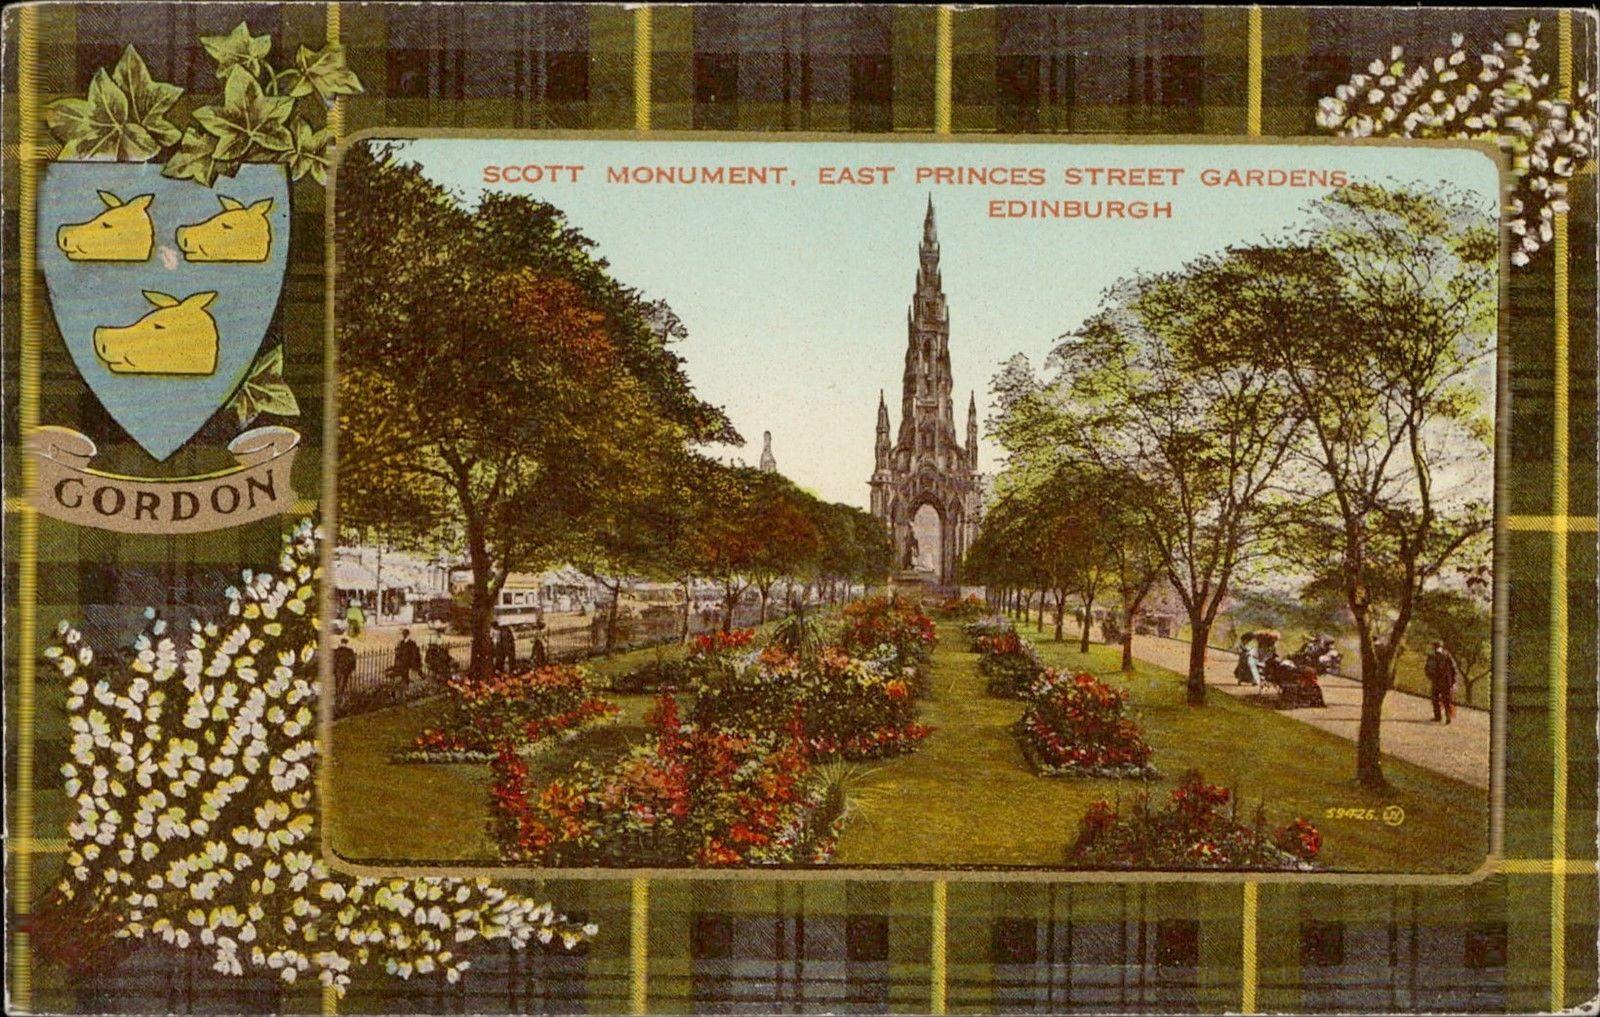 Edinburgh Scott Monument Princes Street Gardens Gordon emblem ...